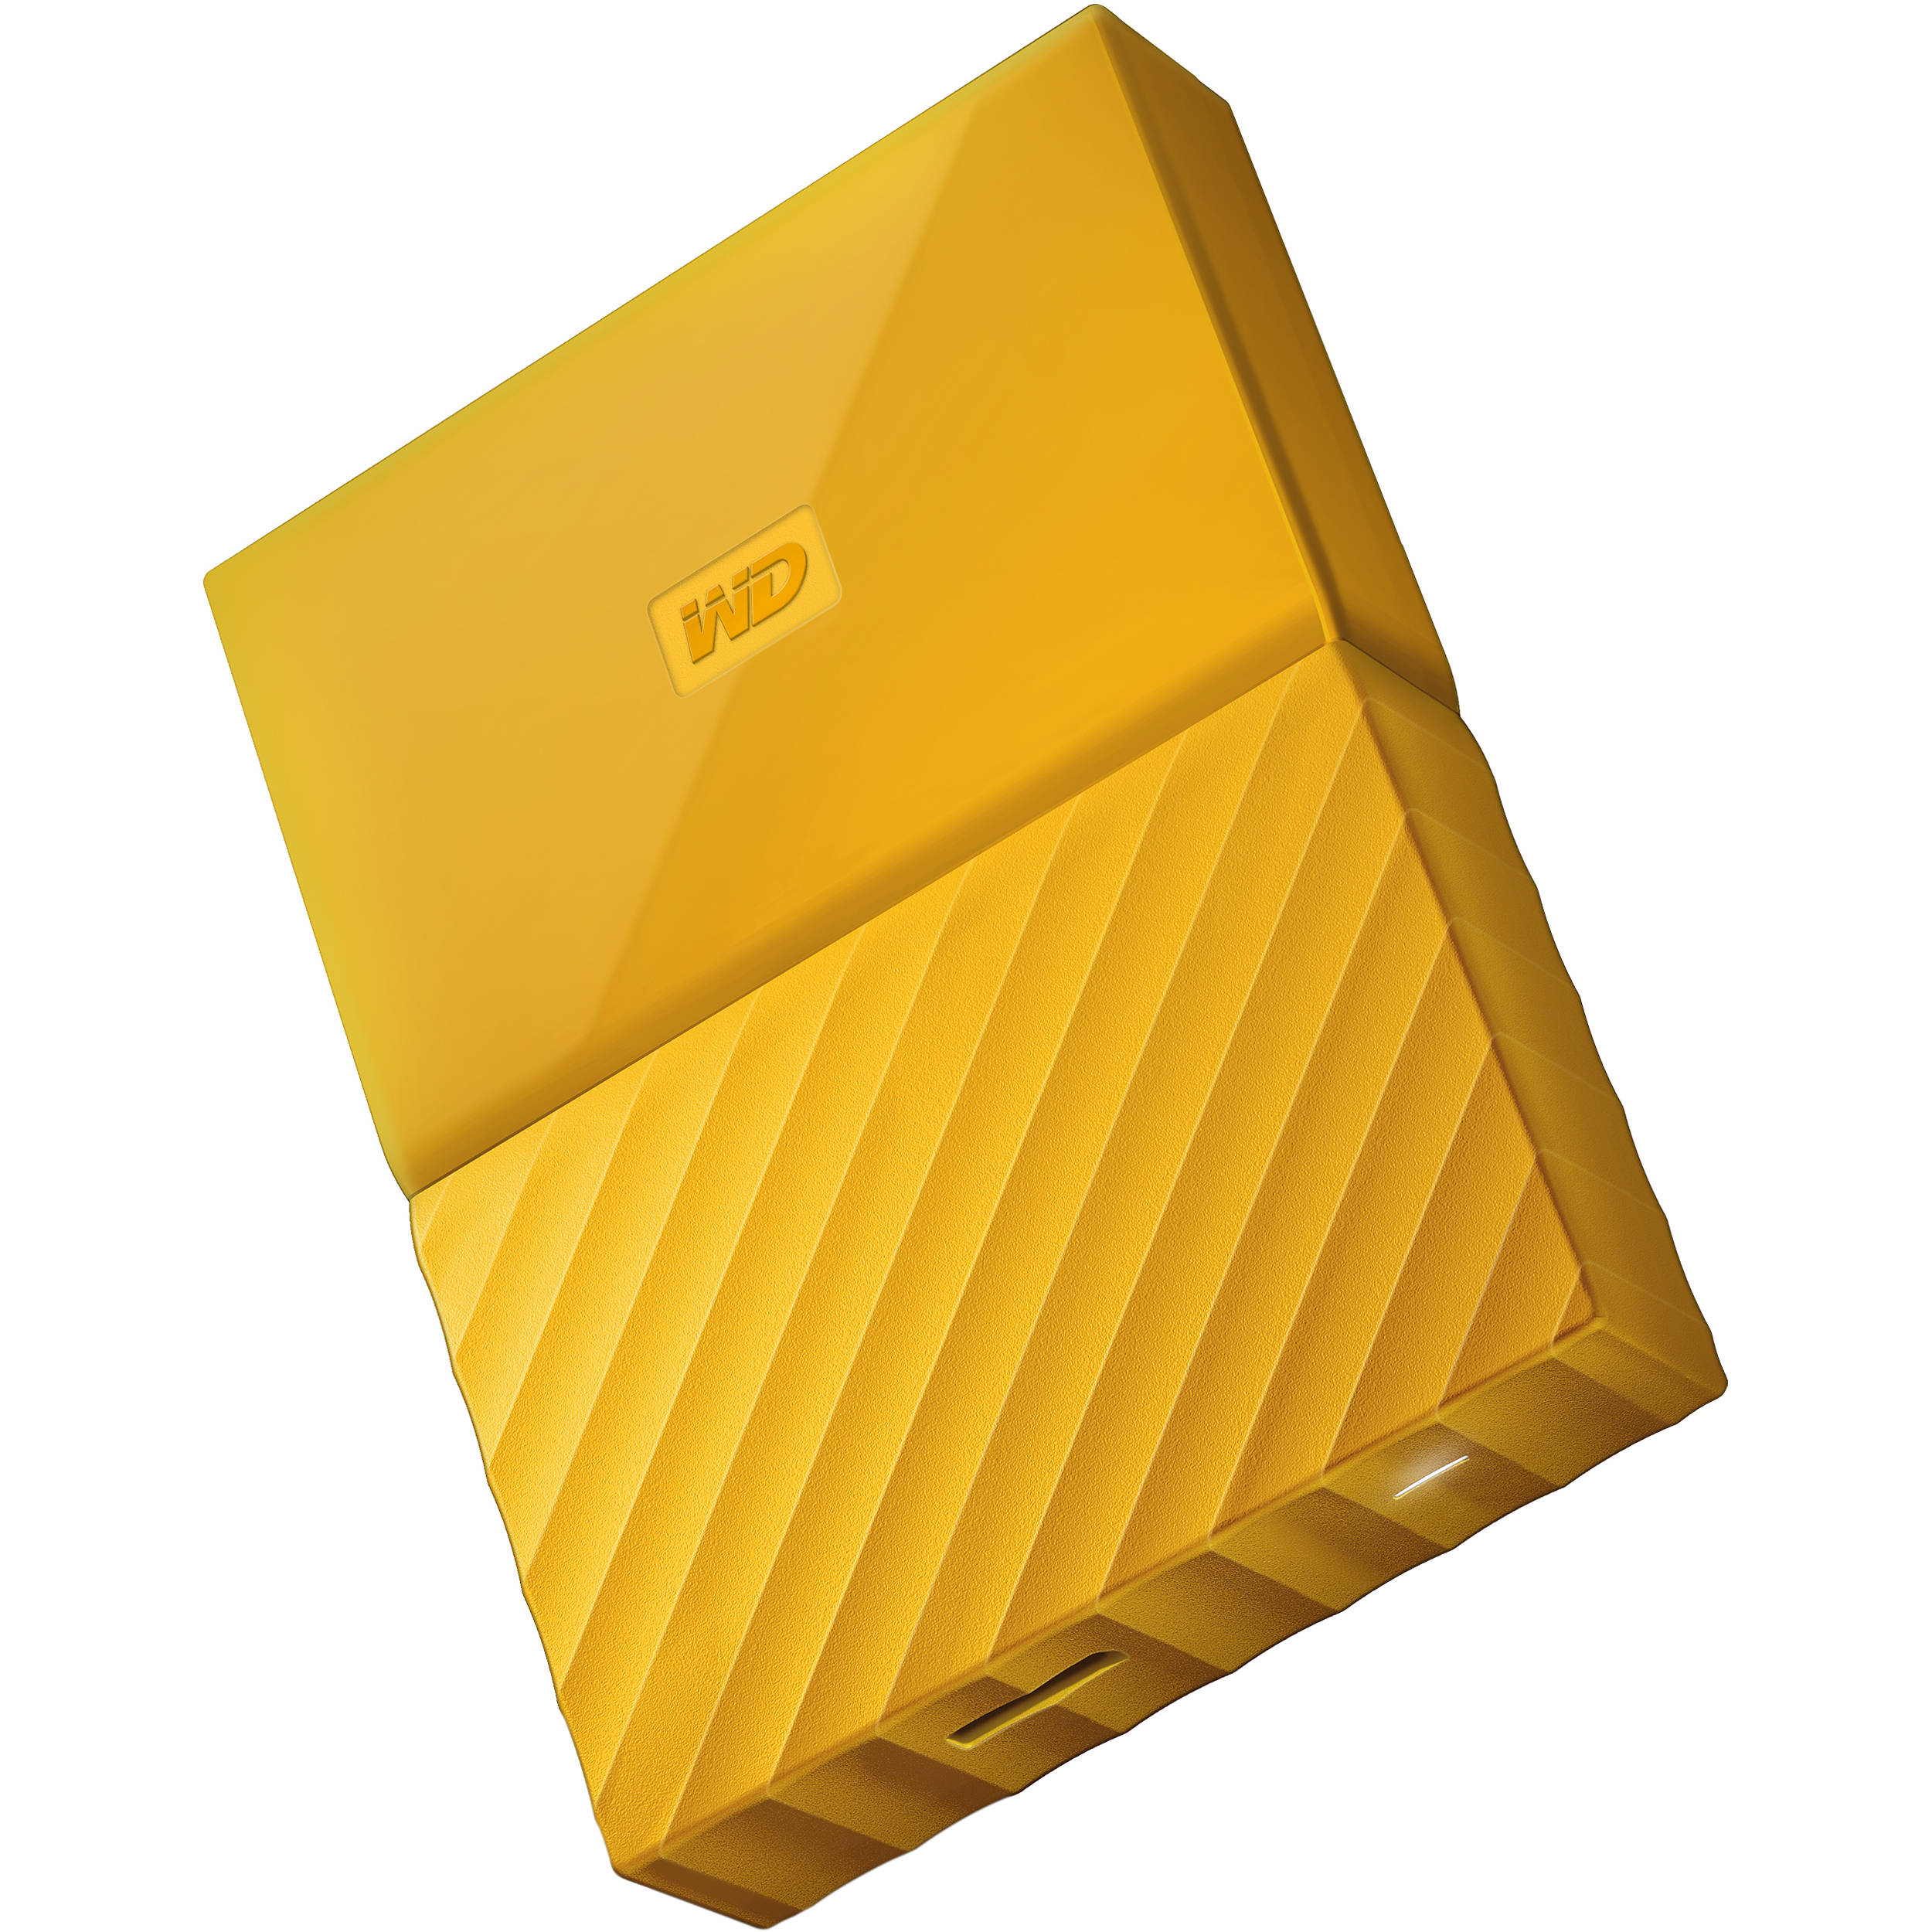 WD 4TB My Passport USB 3 0 Secure Portable Hard Drive (Yellow)